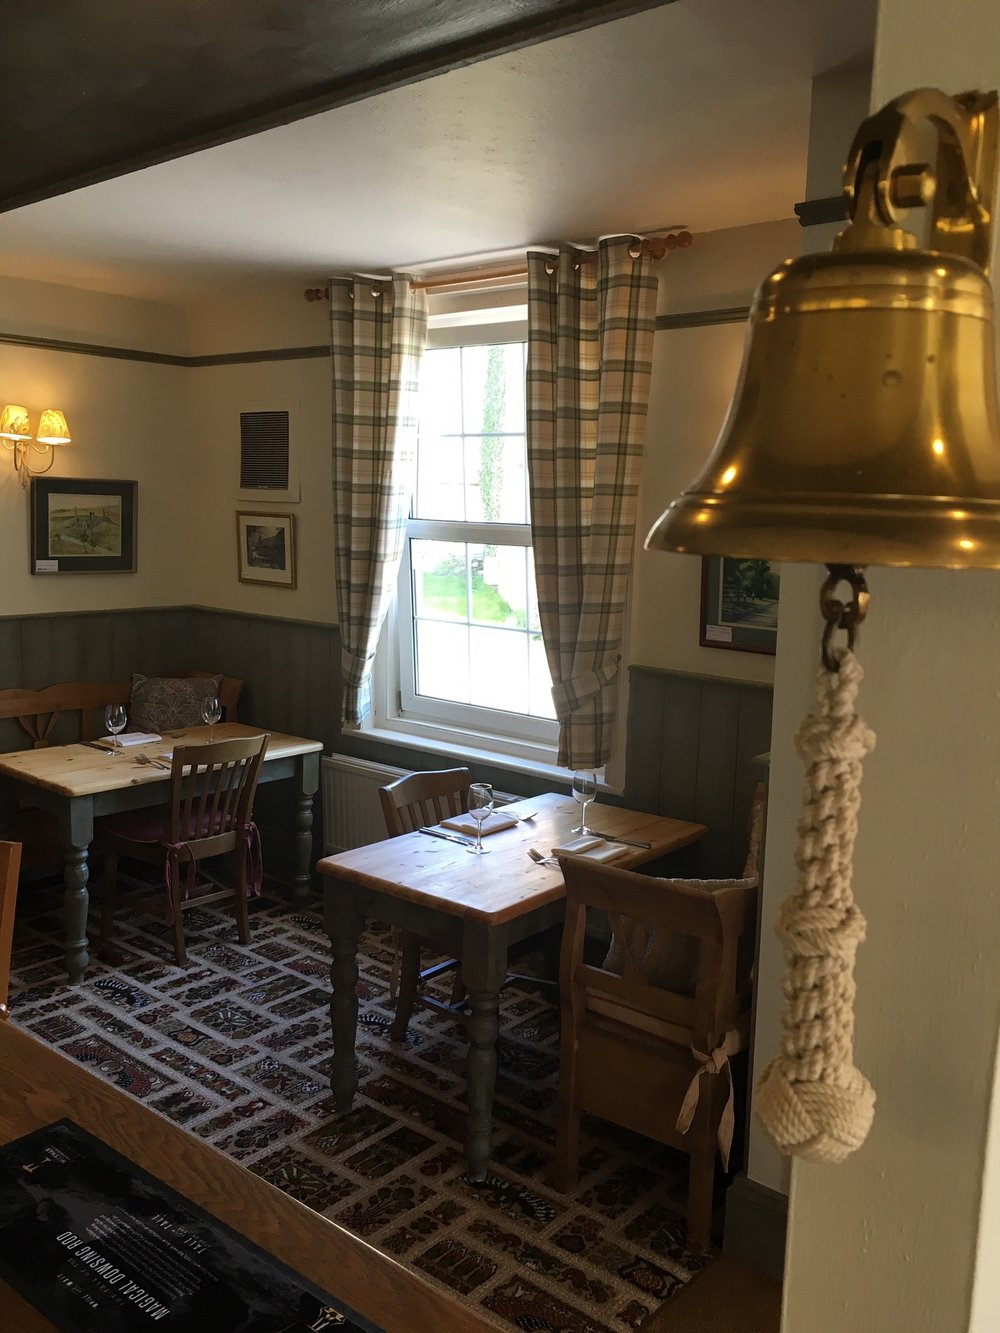 Eagle Tavern at Little Coxwell near Faringdon